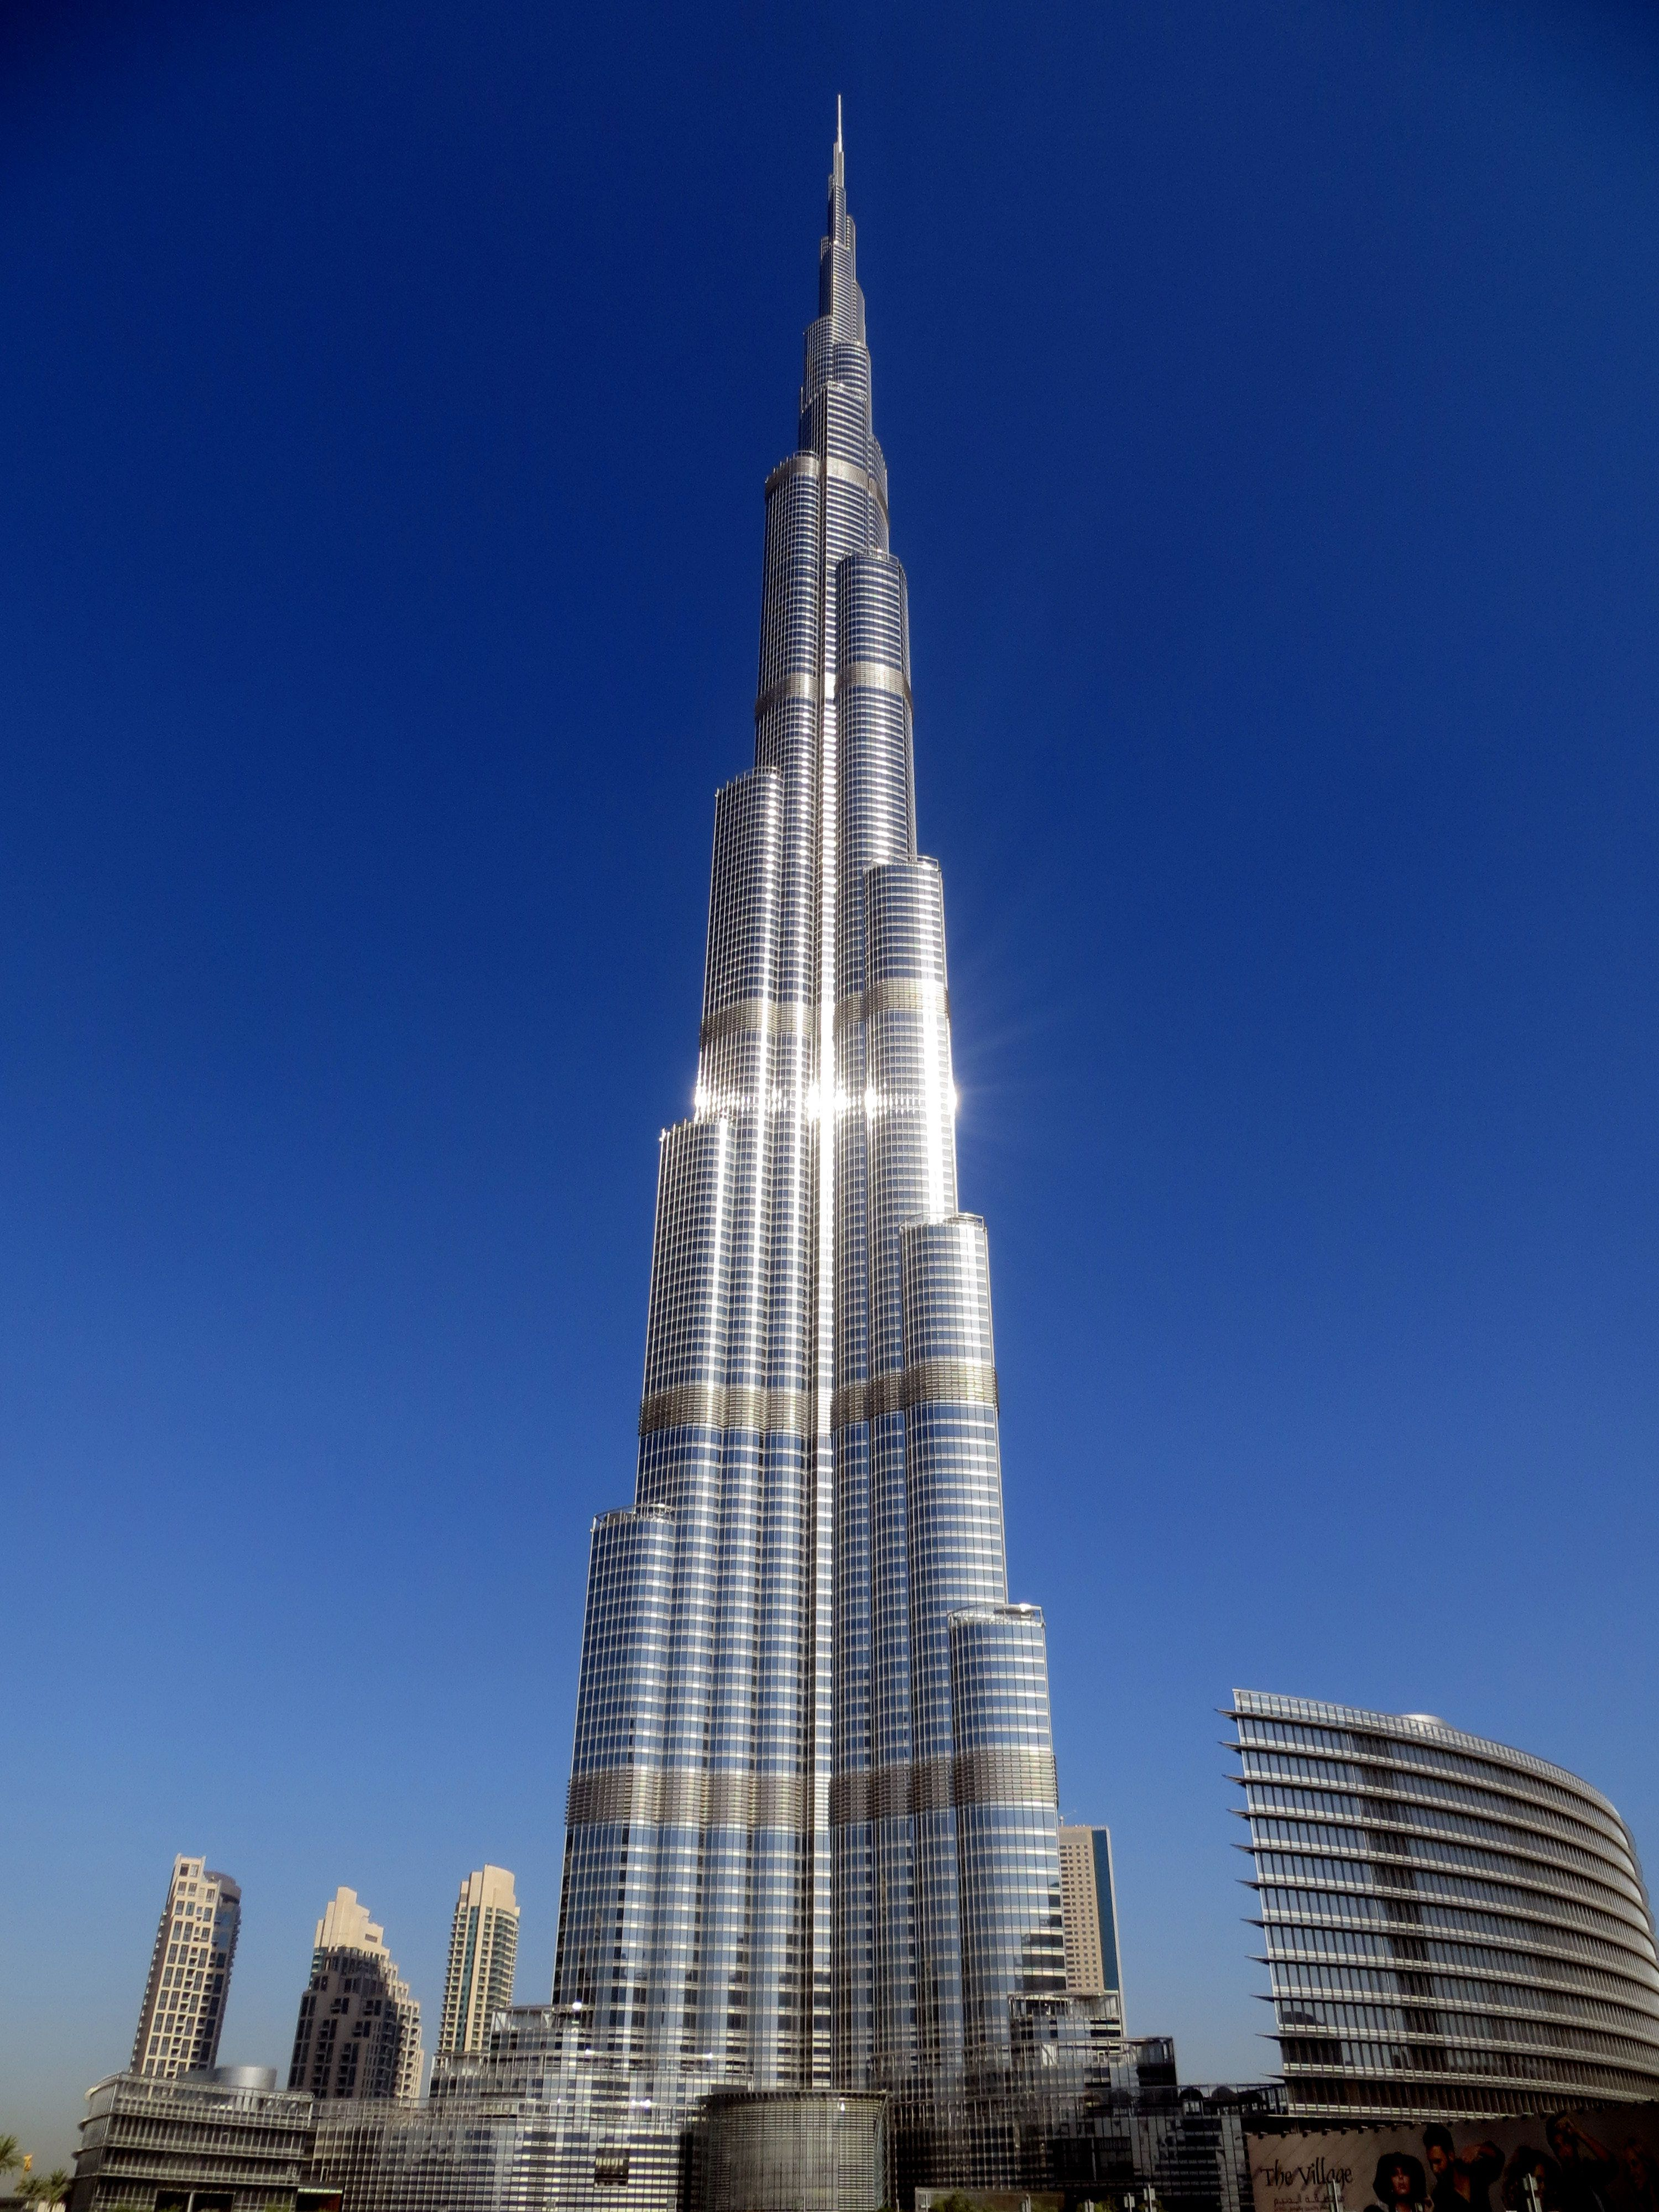 DUBAI u2013 BOOMINGCULTURALSCENE The most populous city